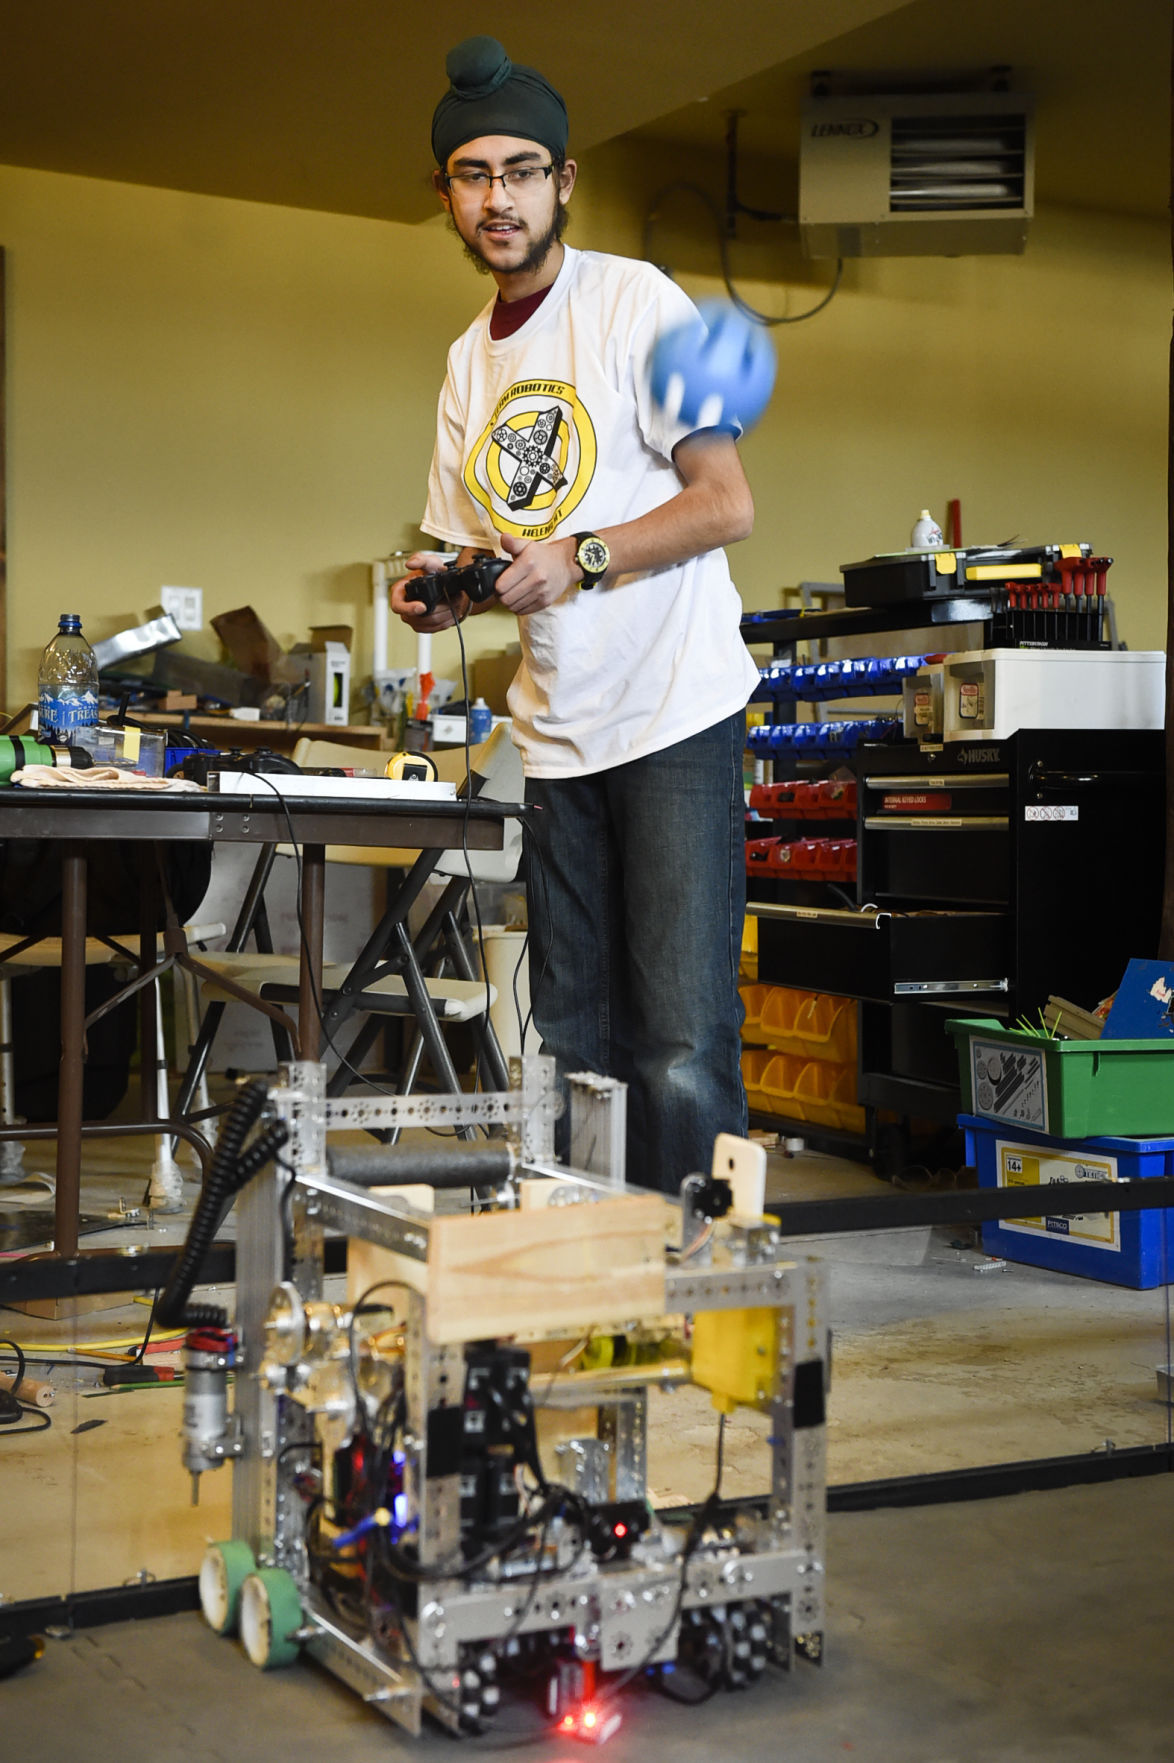 Jaskrit Singh of X-Team Robotics